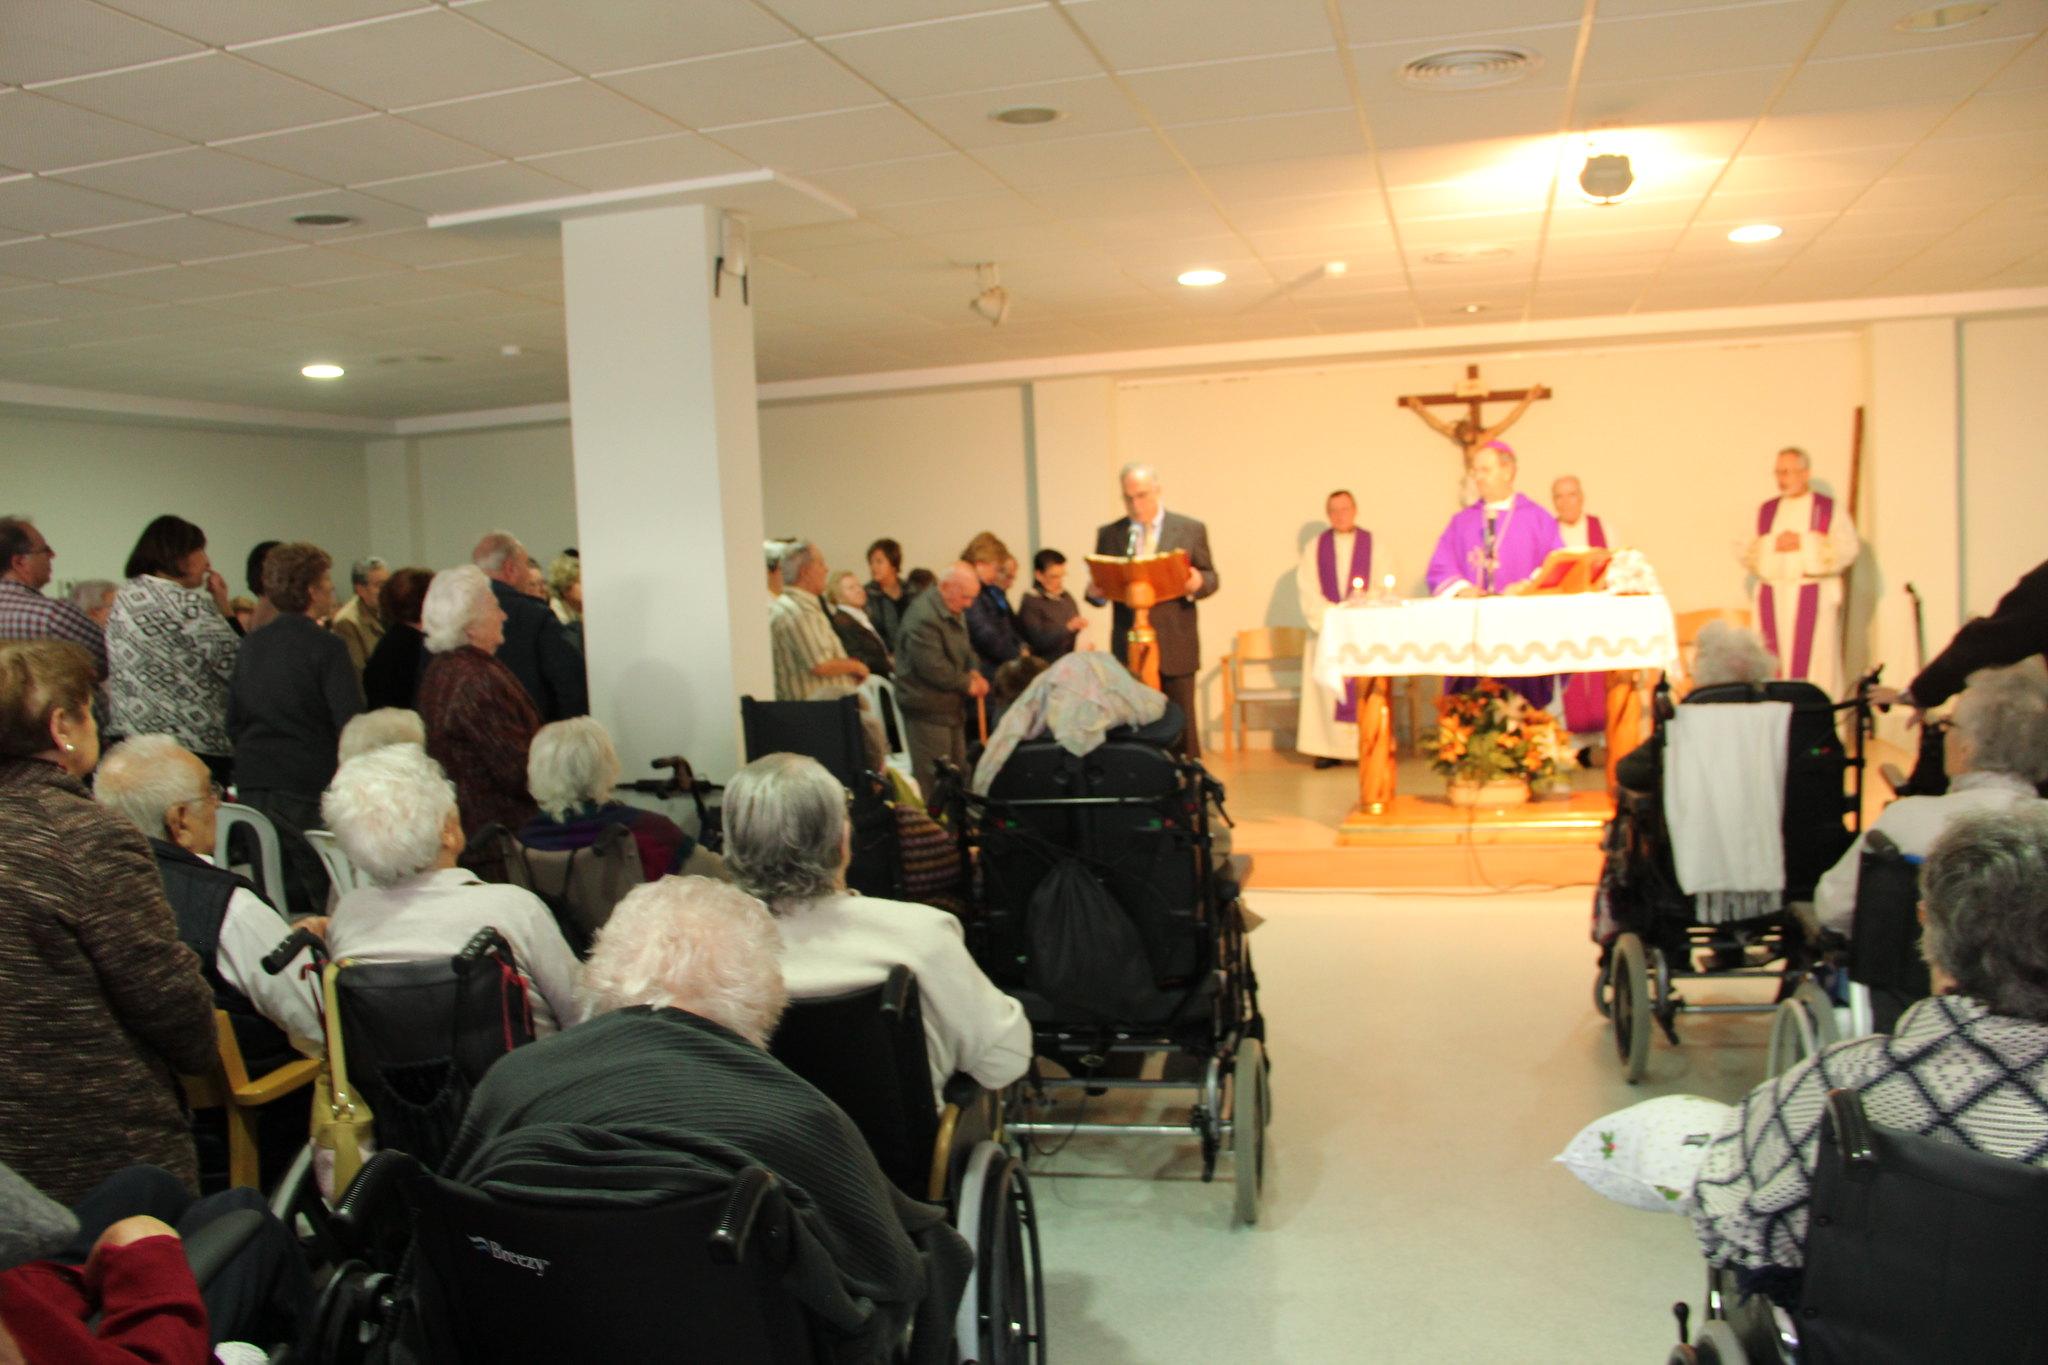 (2016-02-13) - Inauguración Virgen De Lourdes, La Molineta - Archivo La Molineta (023)